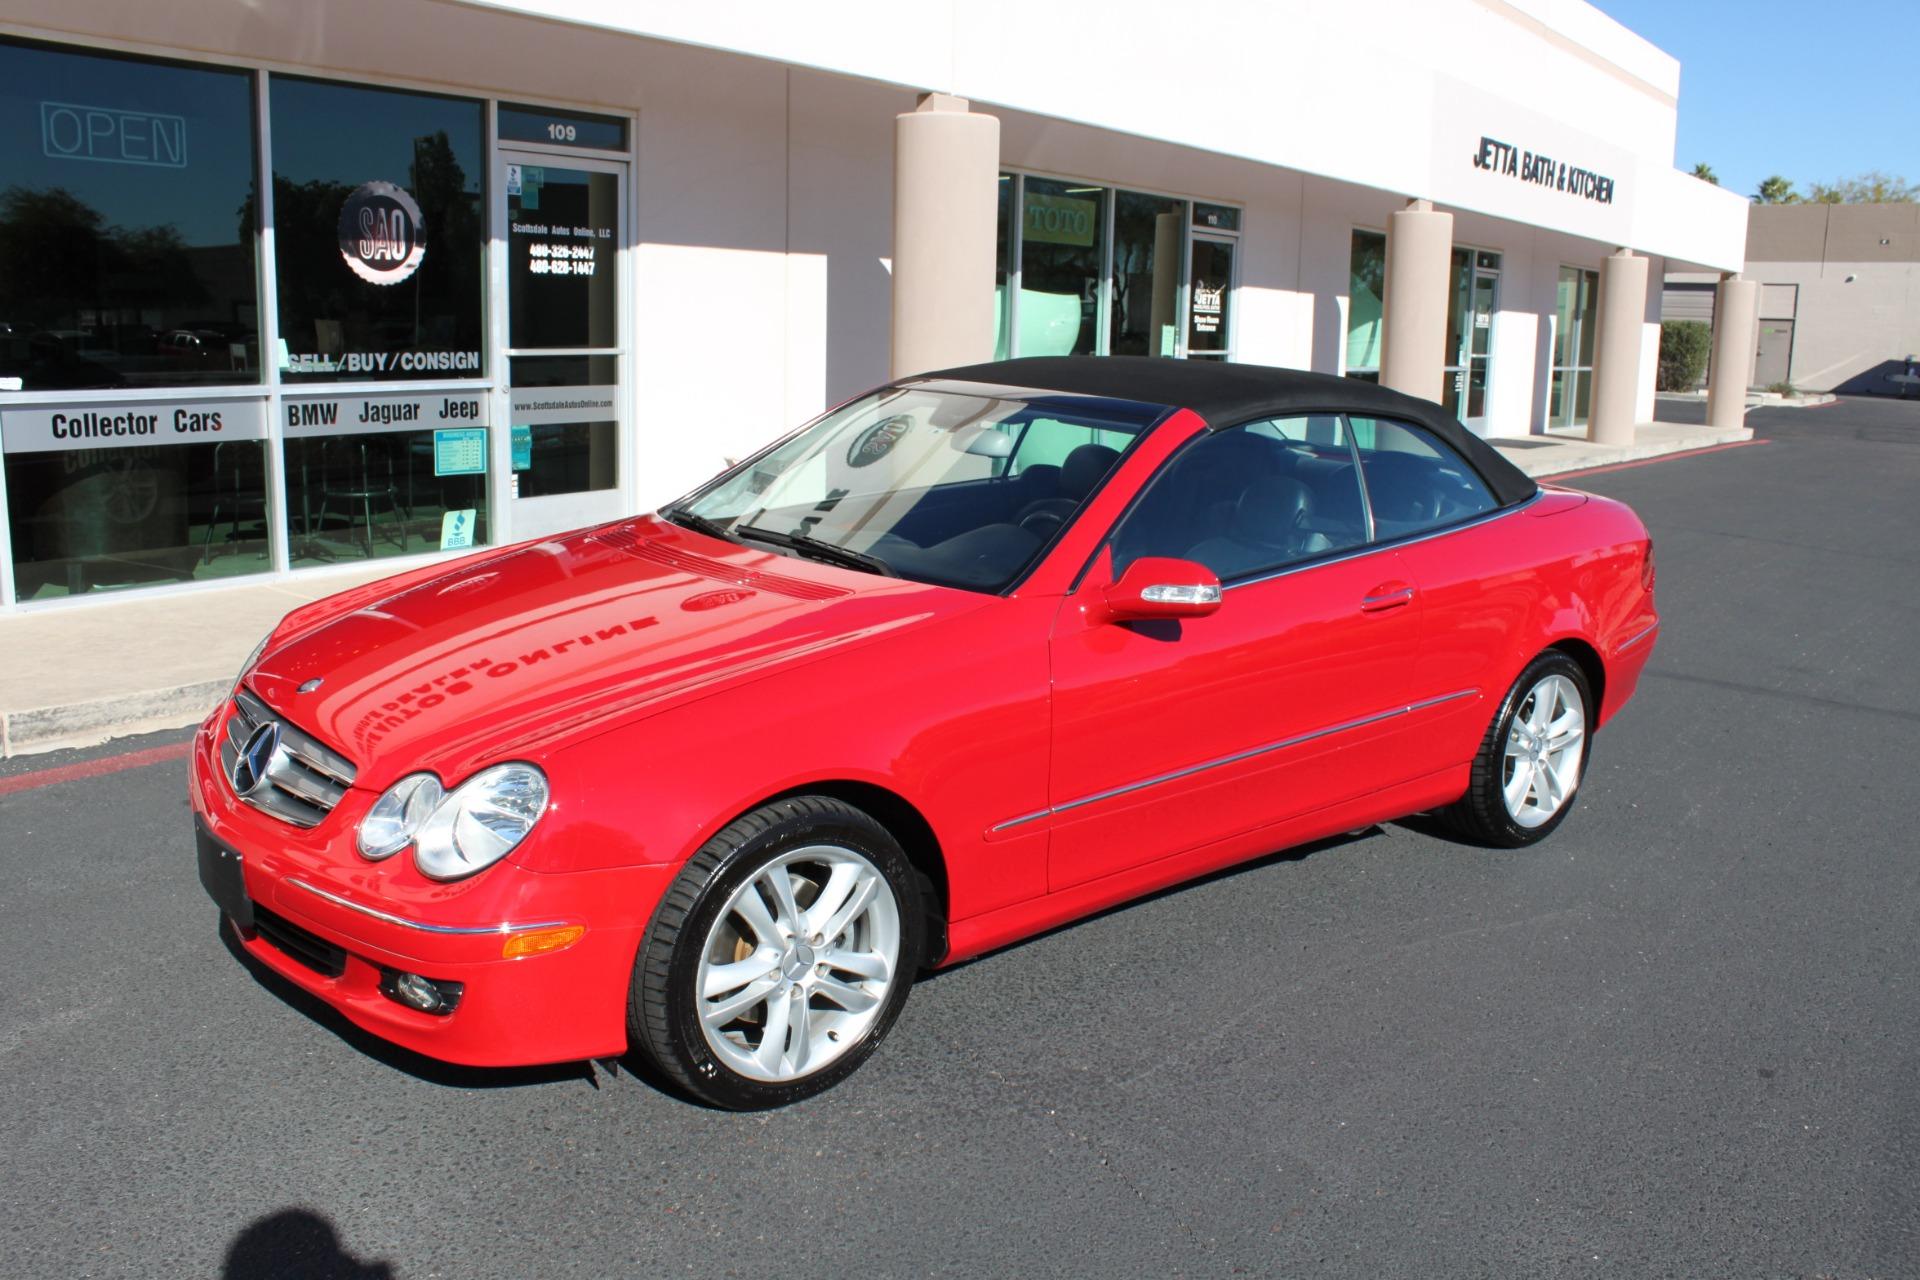 Used-2006-Mercedes-Benz-CLK-Class-CLK350-Cabriolet-35L-Chalenger